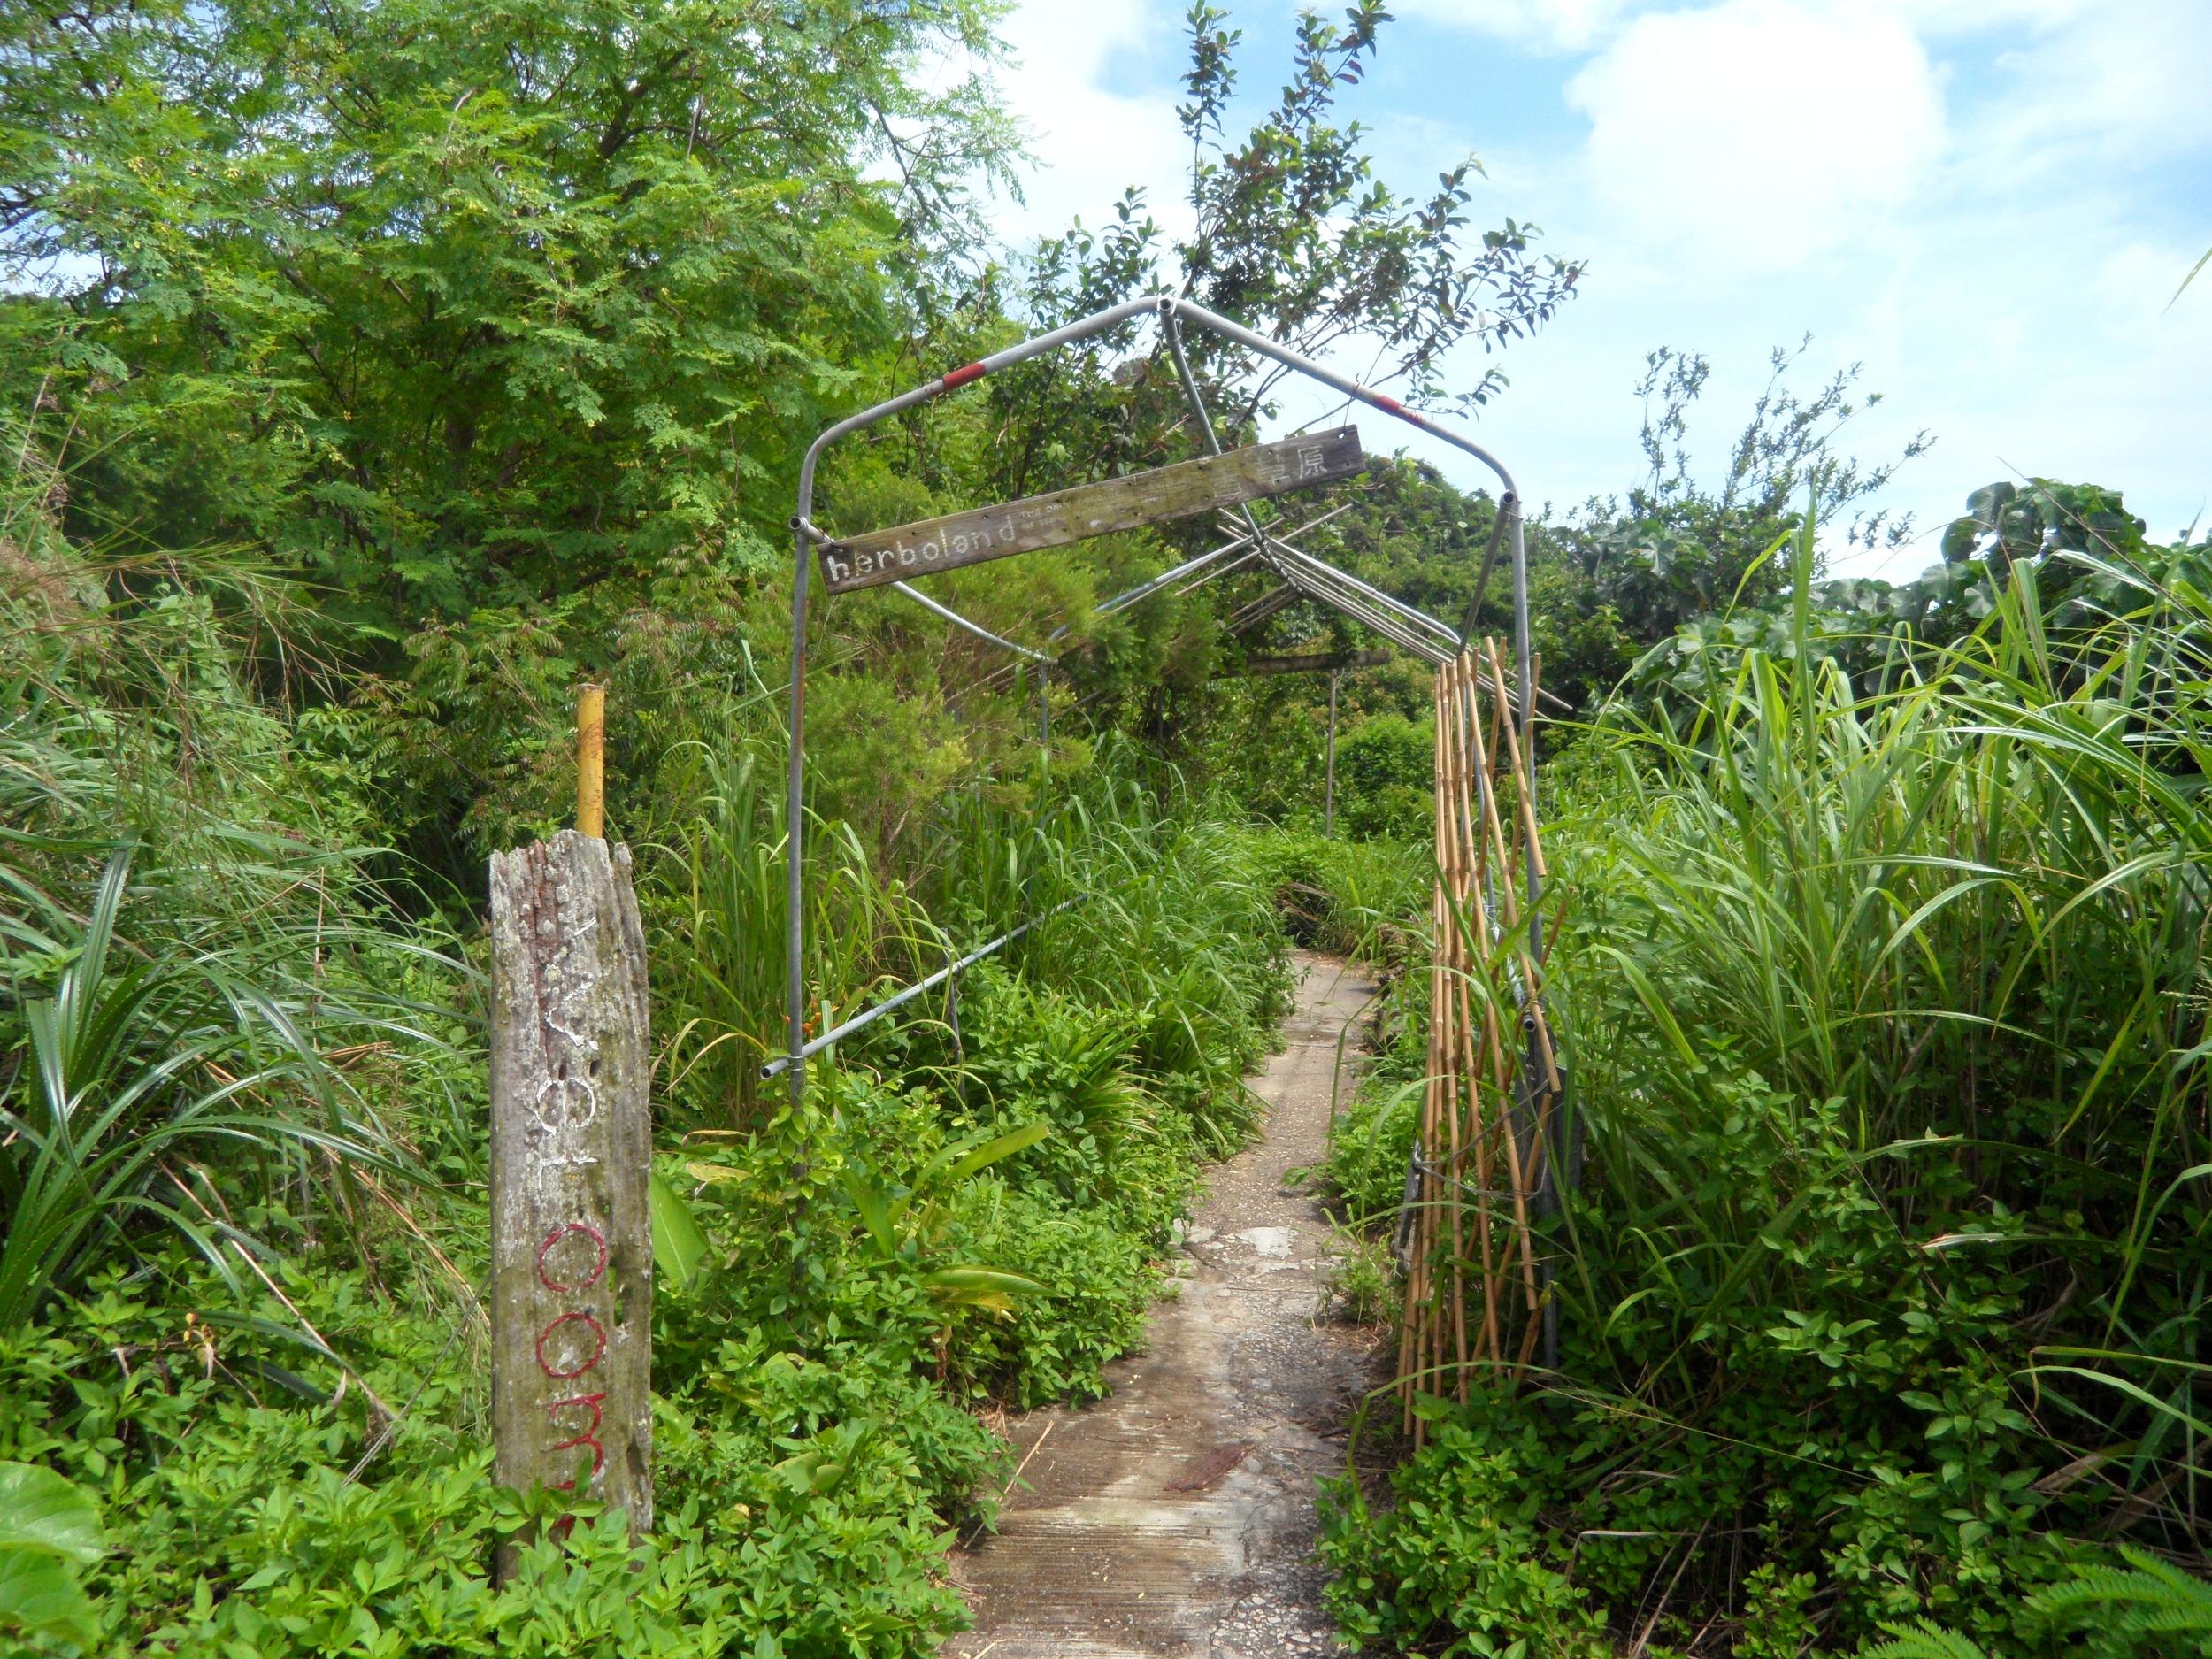 Herboland: Hong Kong's organic herb farm